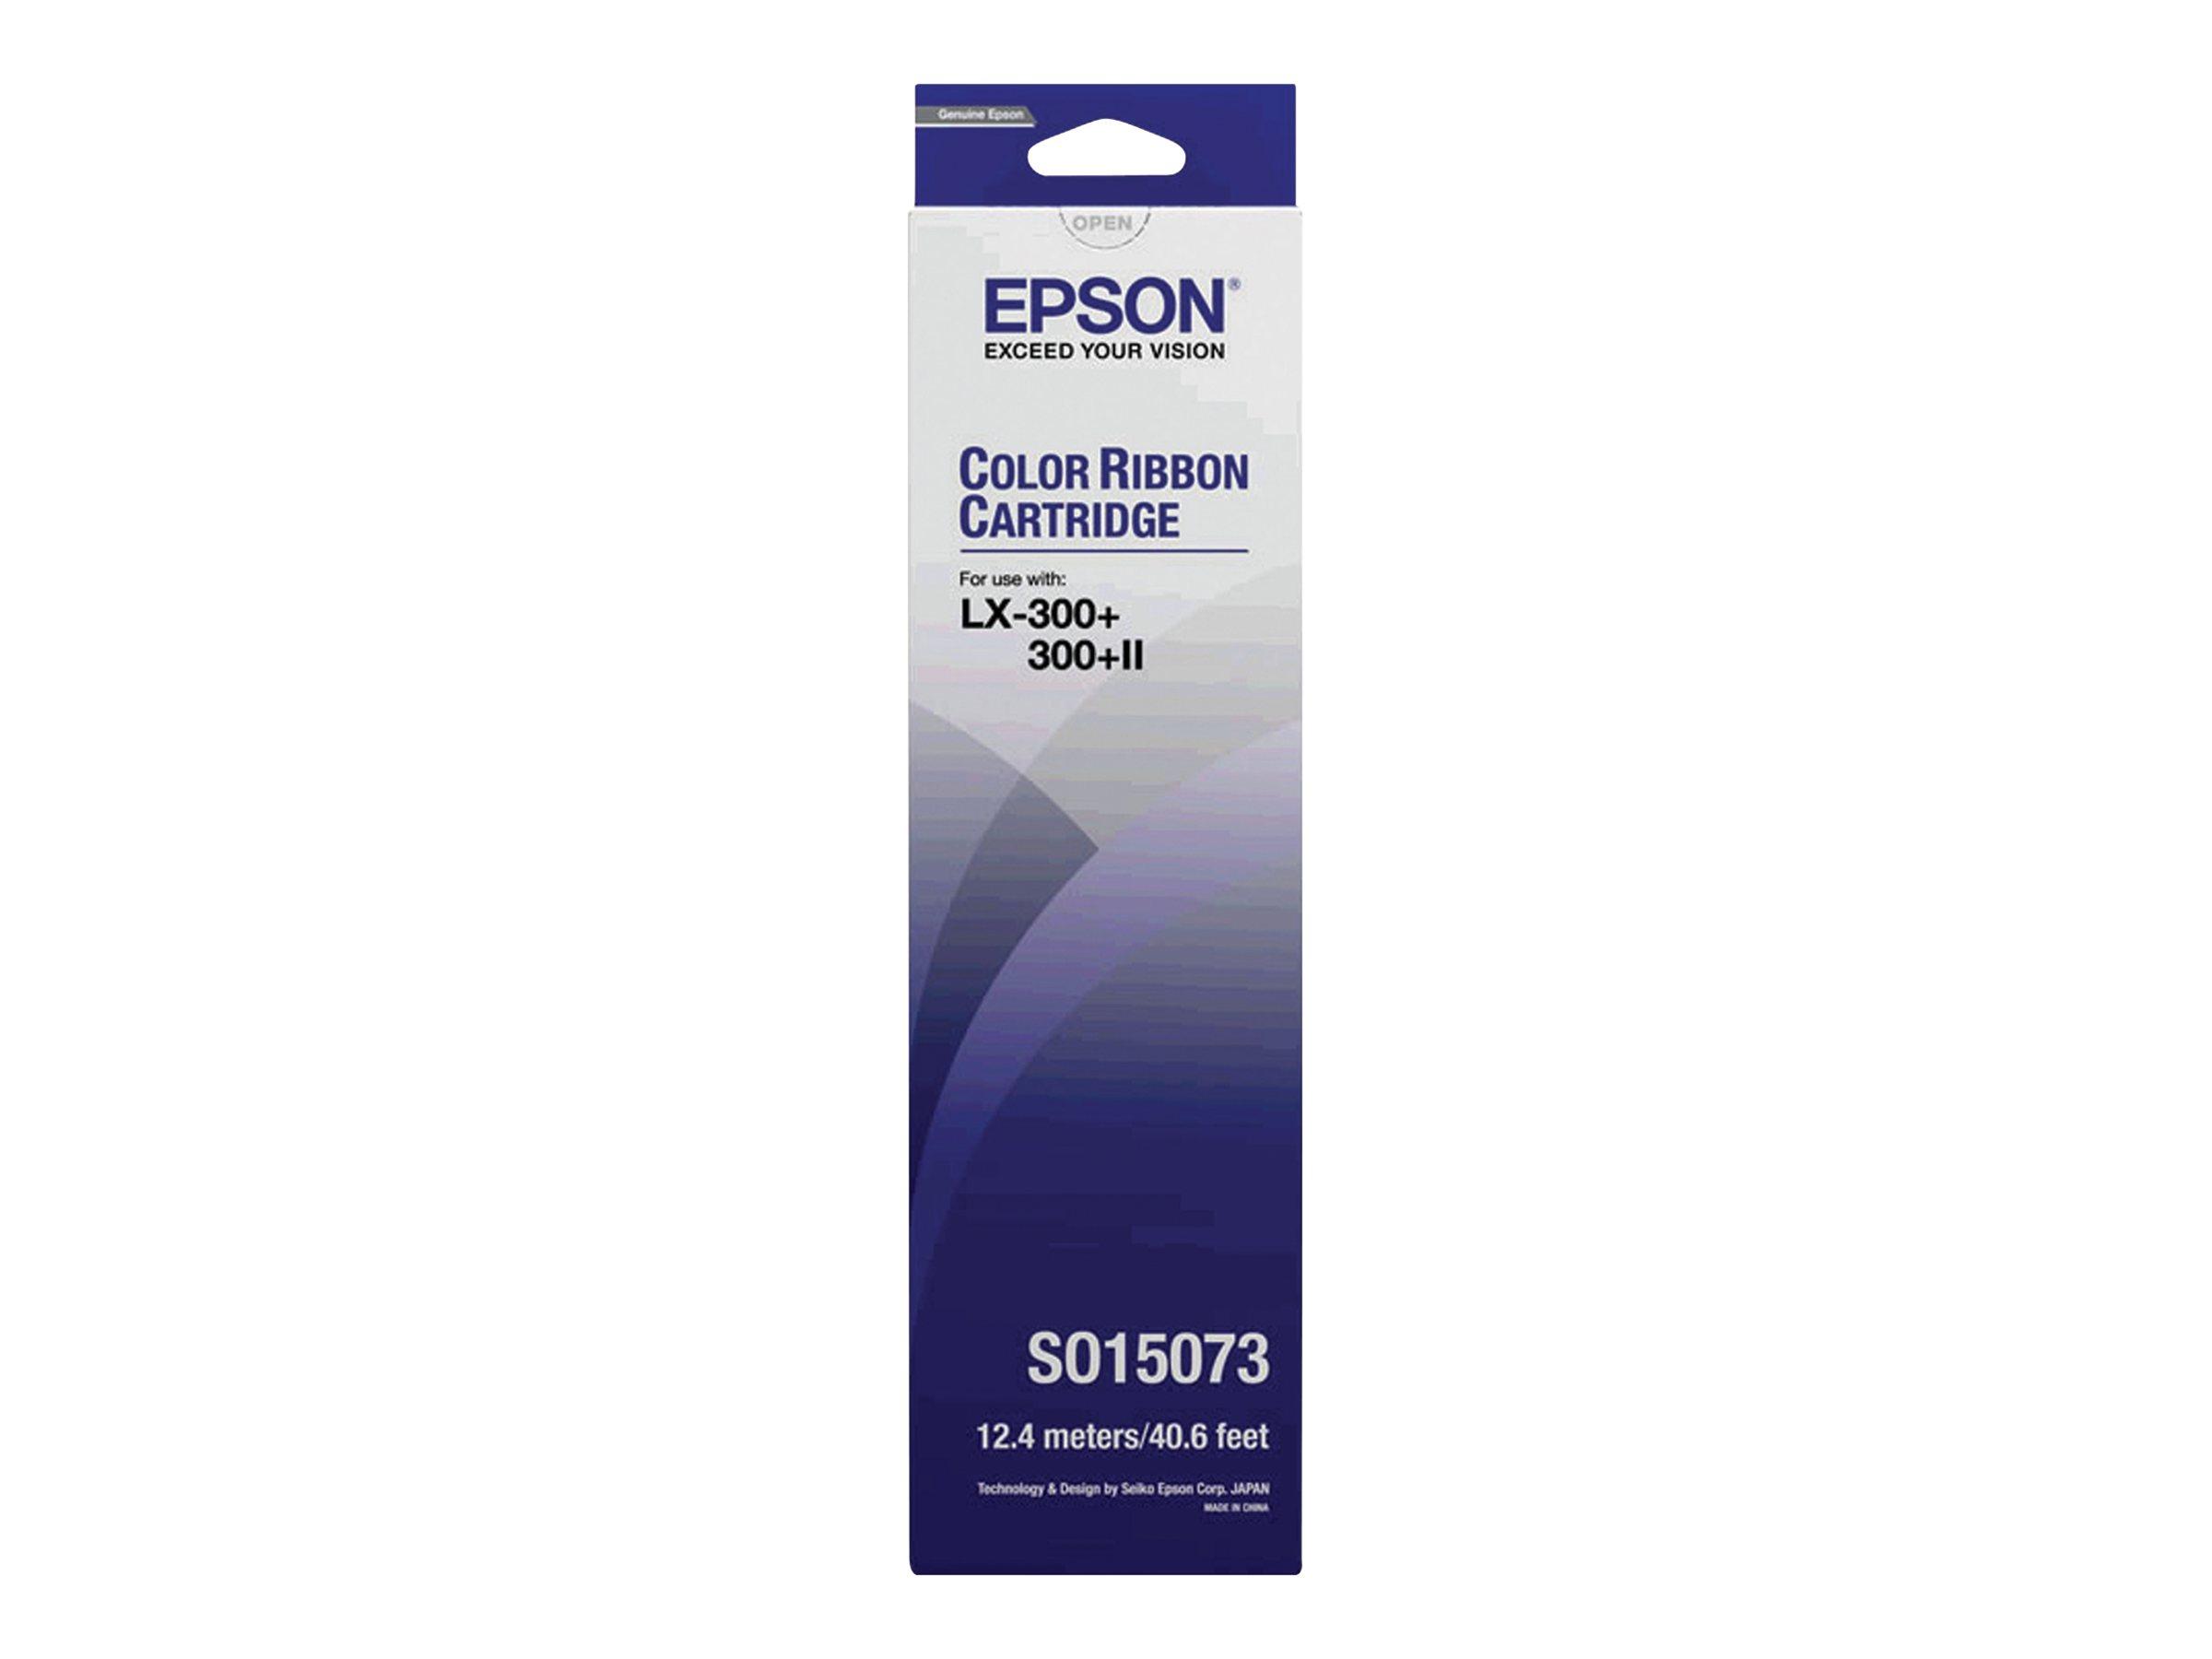 Epson - 1 - Gelb, Cyan, Magenta - Textilband - für LX 300, 300+, 300+II, 300+II Colour